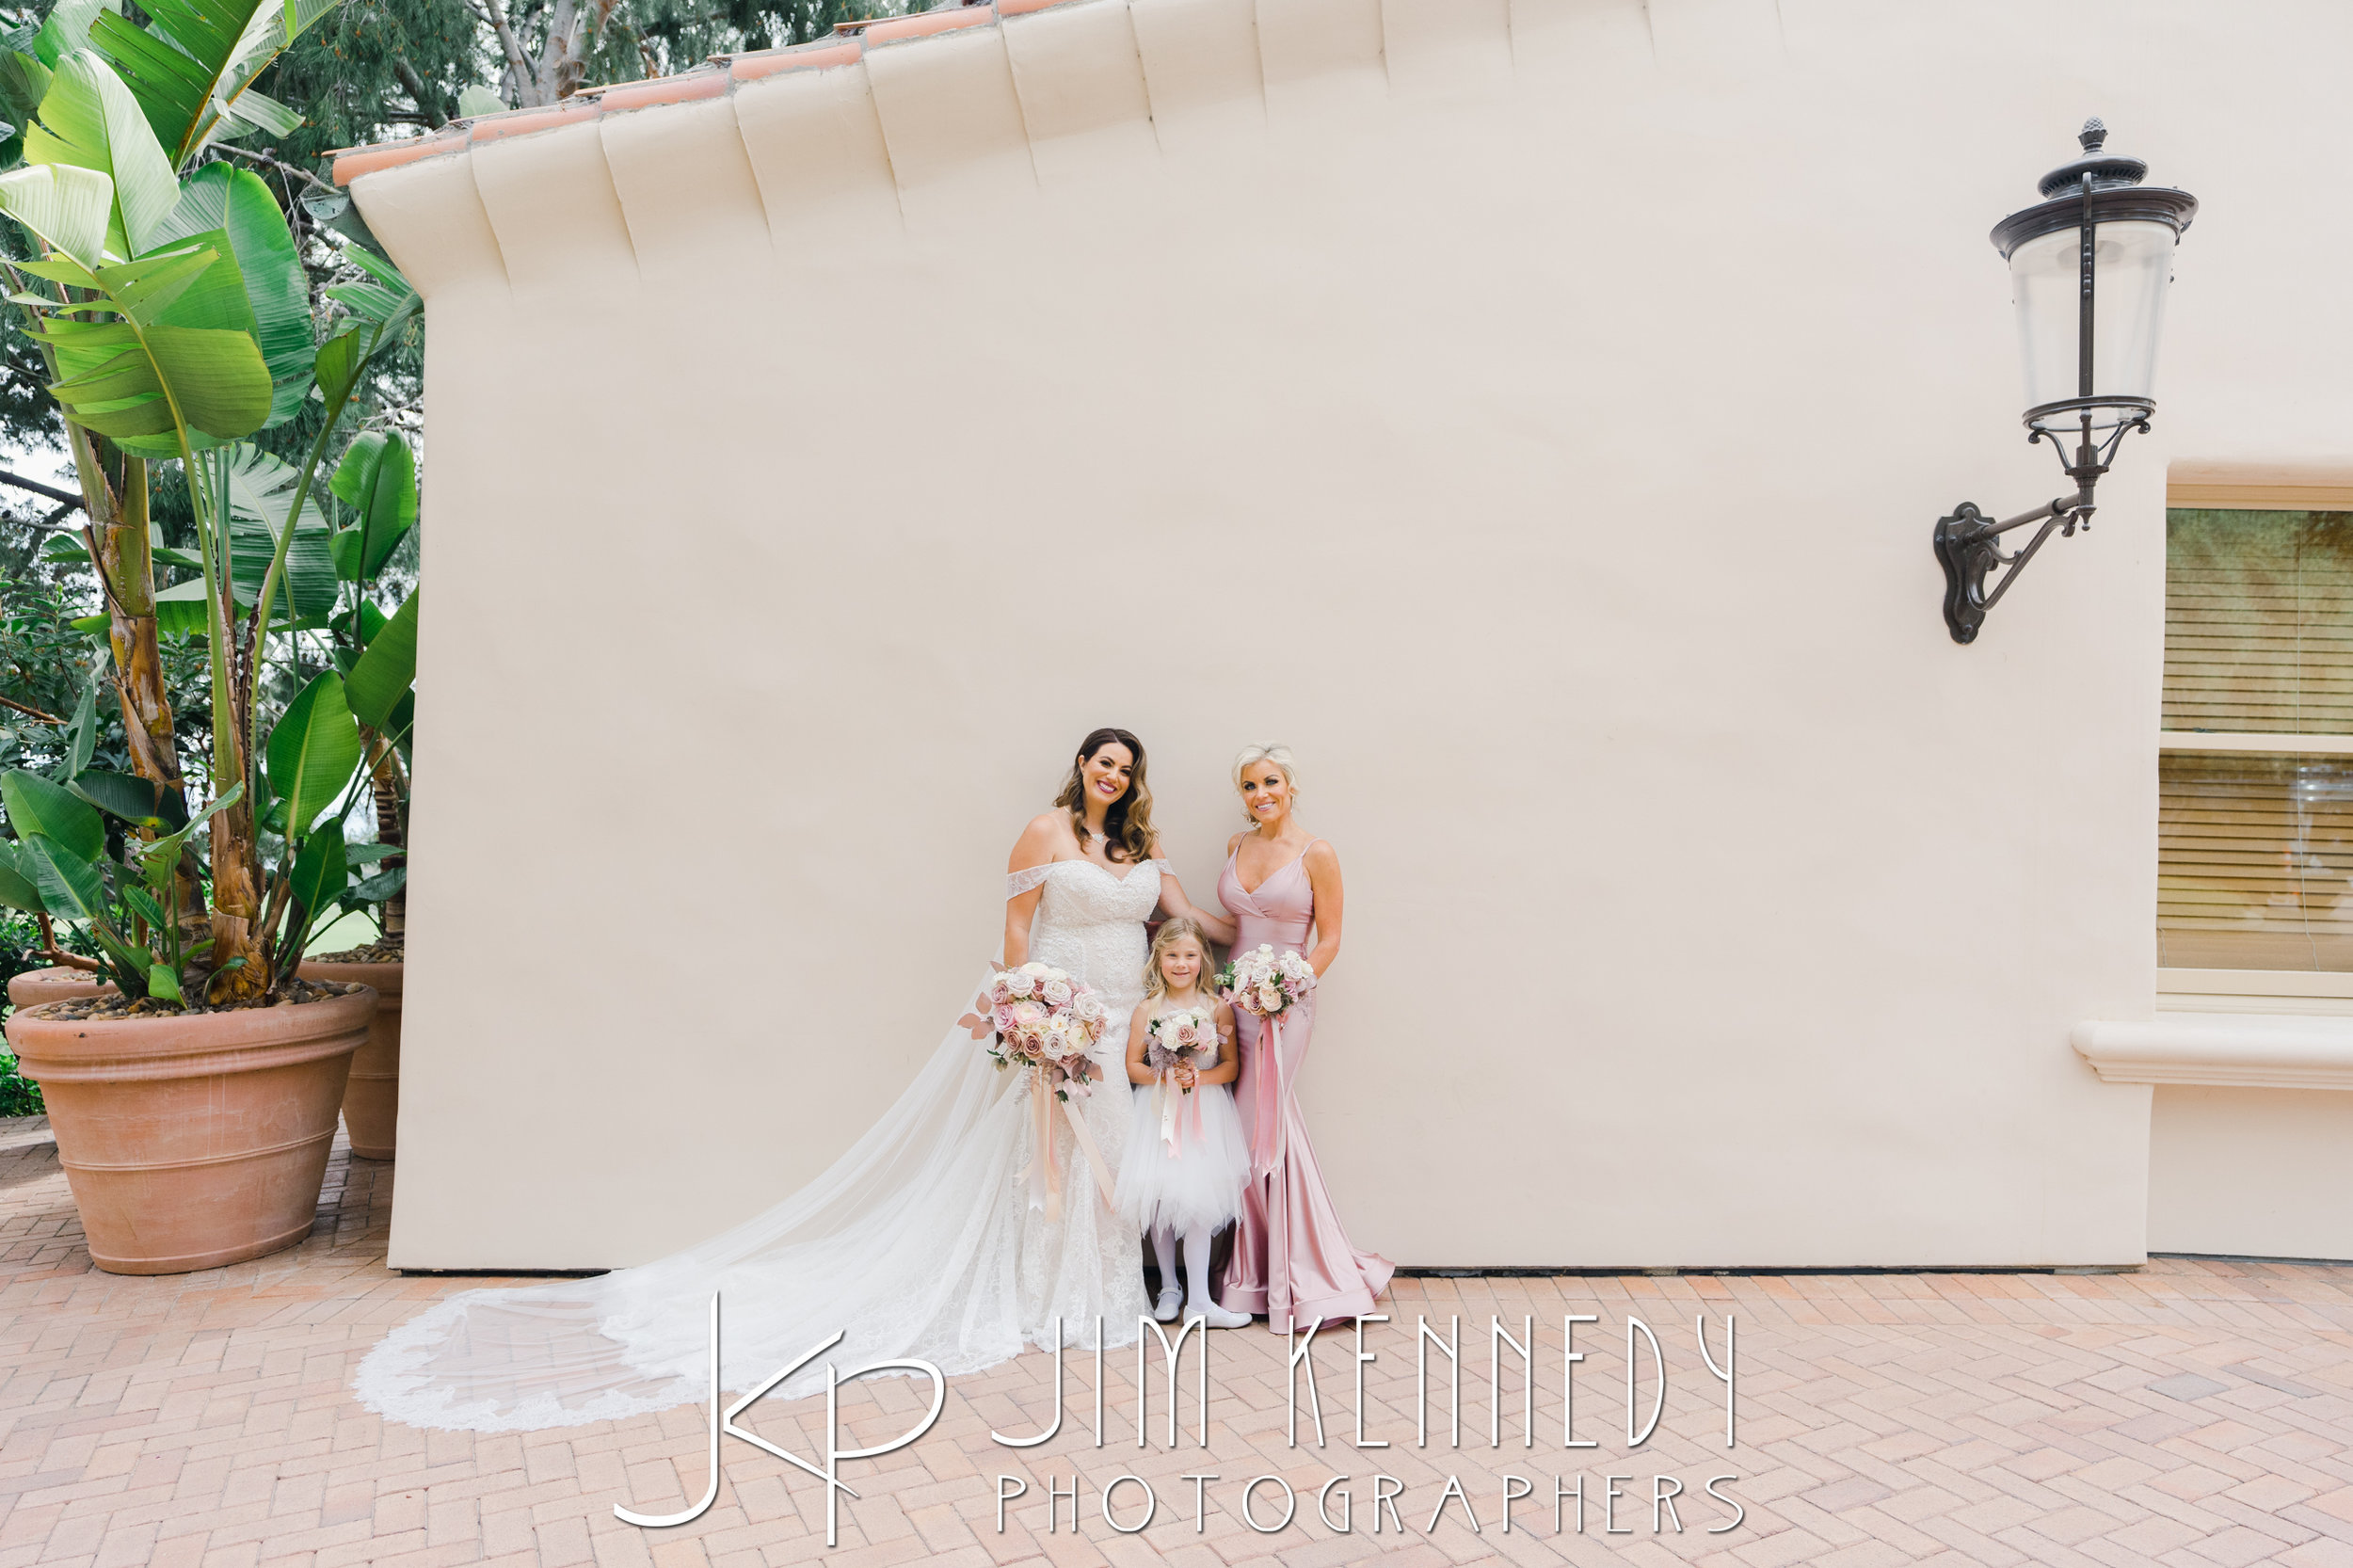 pelican-hill-wedding-jim-kenedy-photographers_0068.JPG